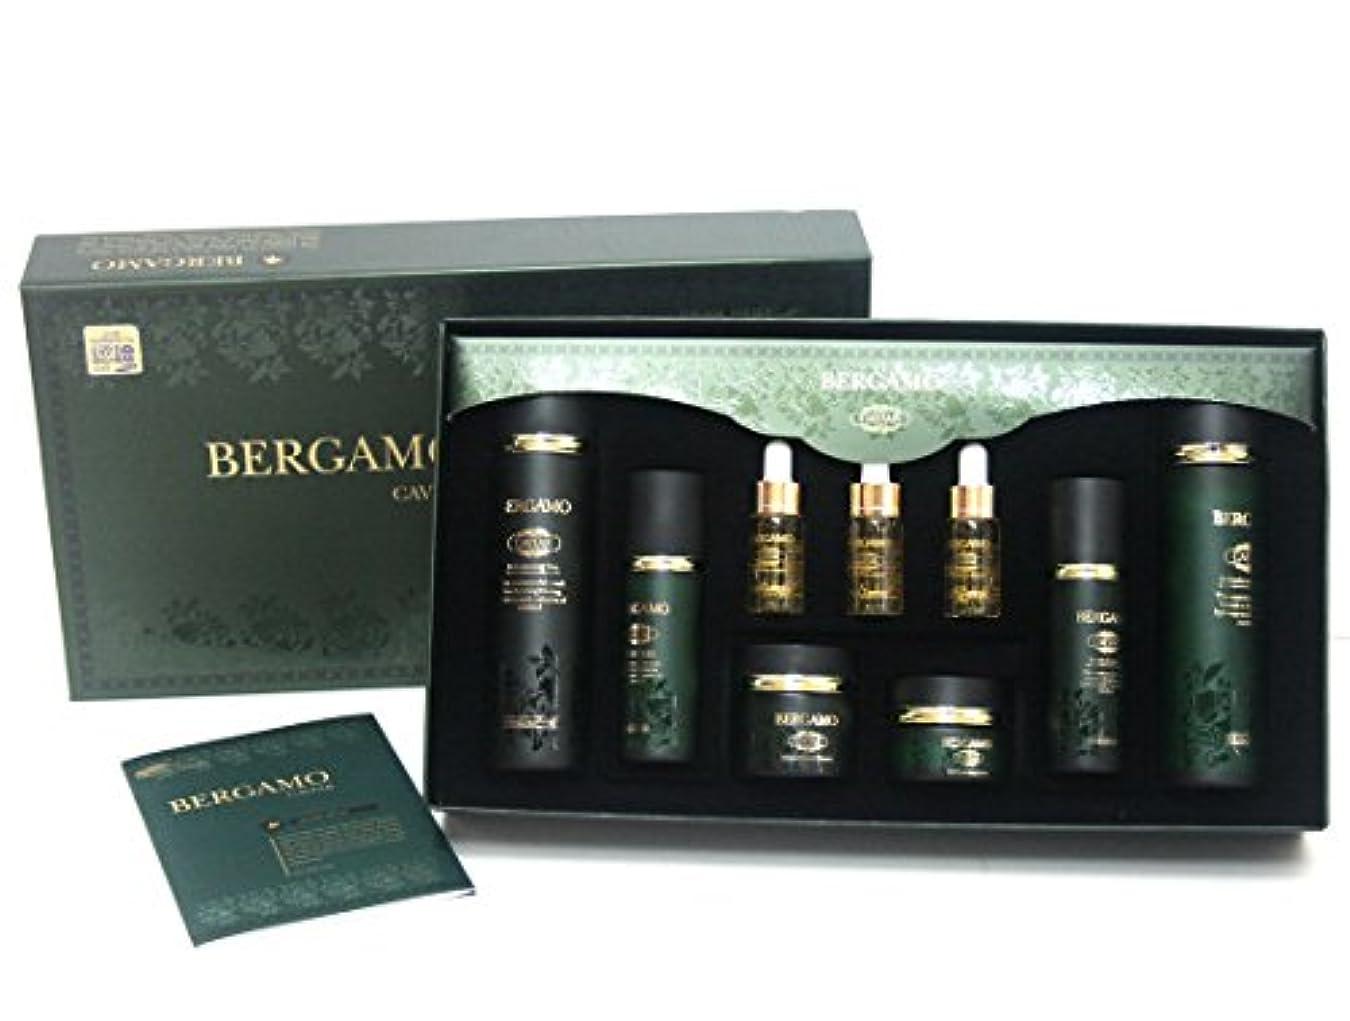 [Bergamo] キャビアの豪華ギフトセットプログラムセット9pcs/水分、栄養、弾力/韓国の化粧品/Caviar Luxuries Gift Set Program Set 9pcs/Moisture, nutrition...